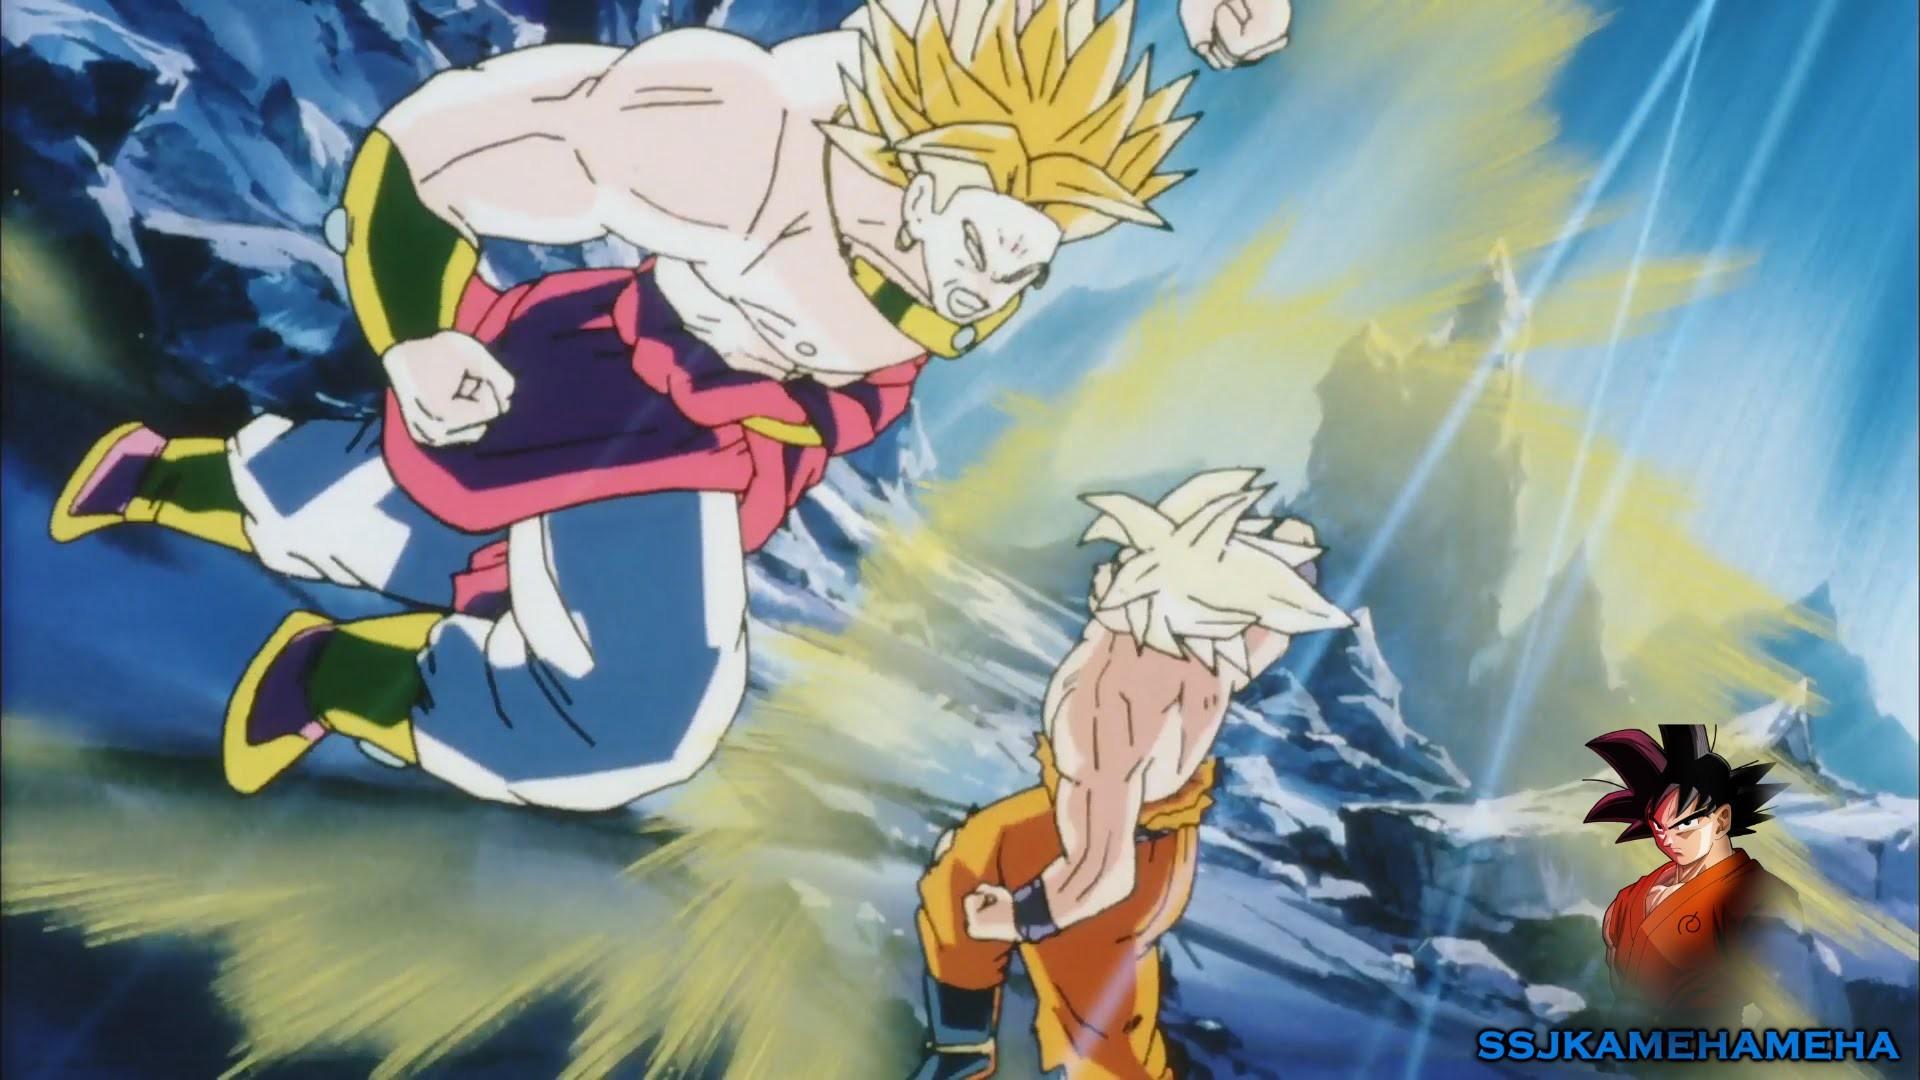 Goku Vs Broly Wallpaper (61+ Images